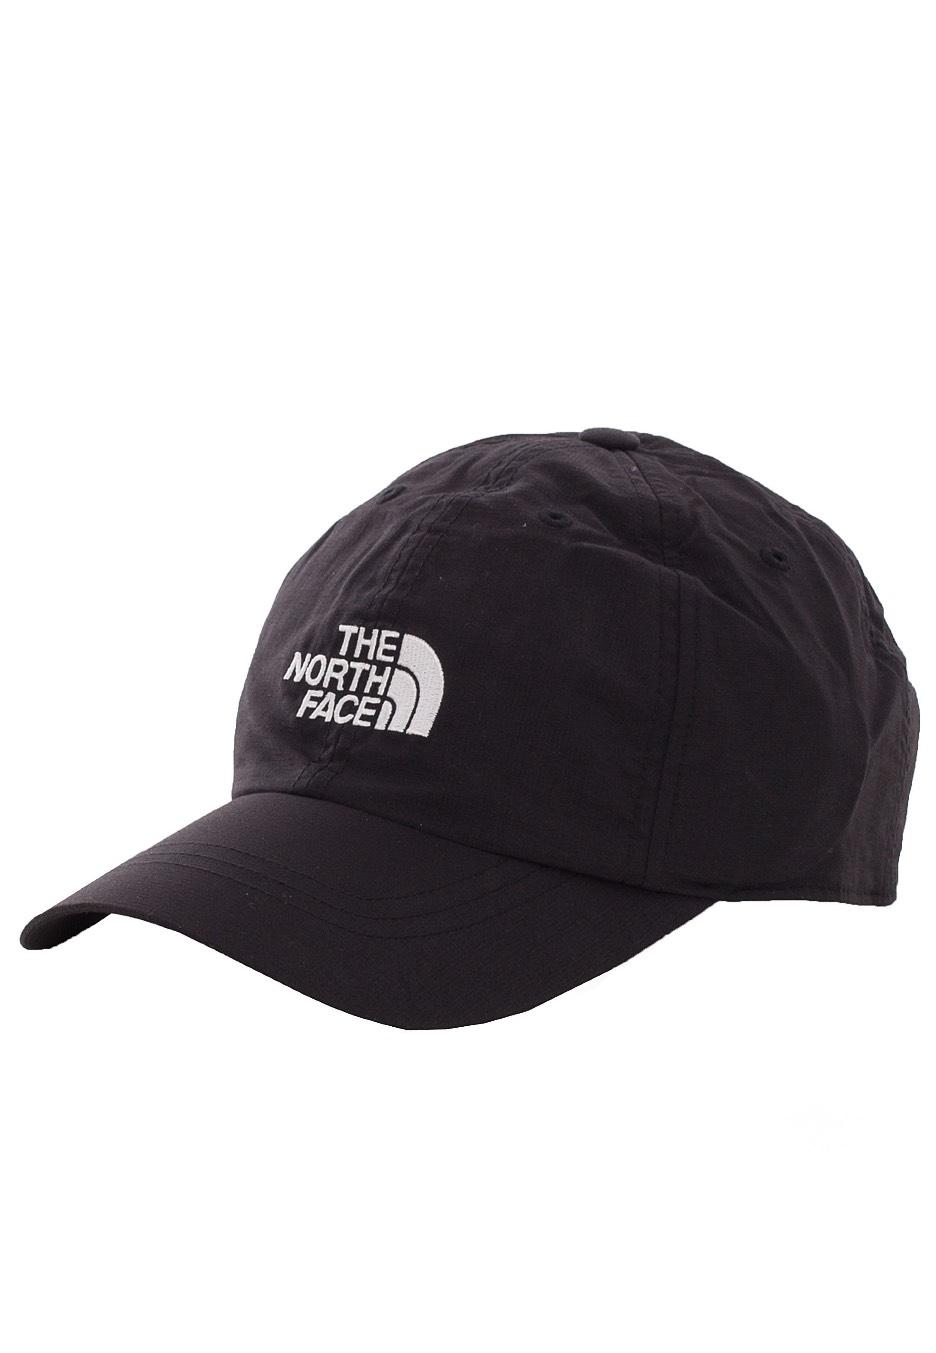 The North Face - Horizon Black - Caps